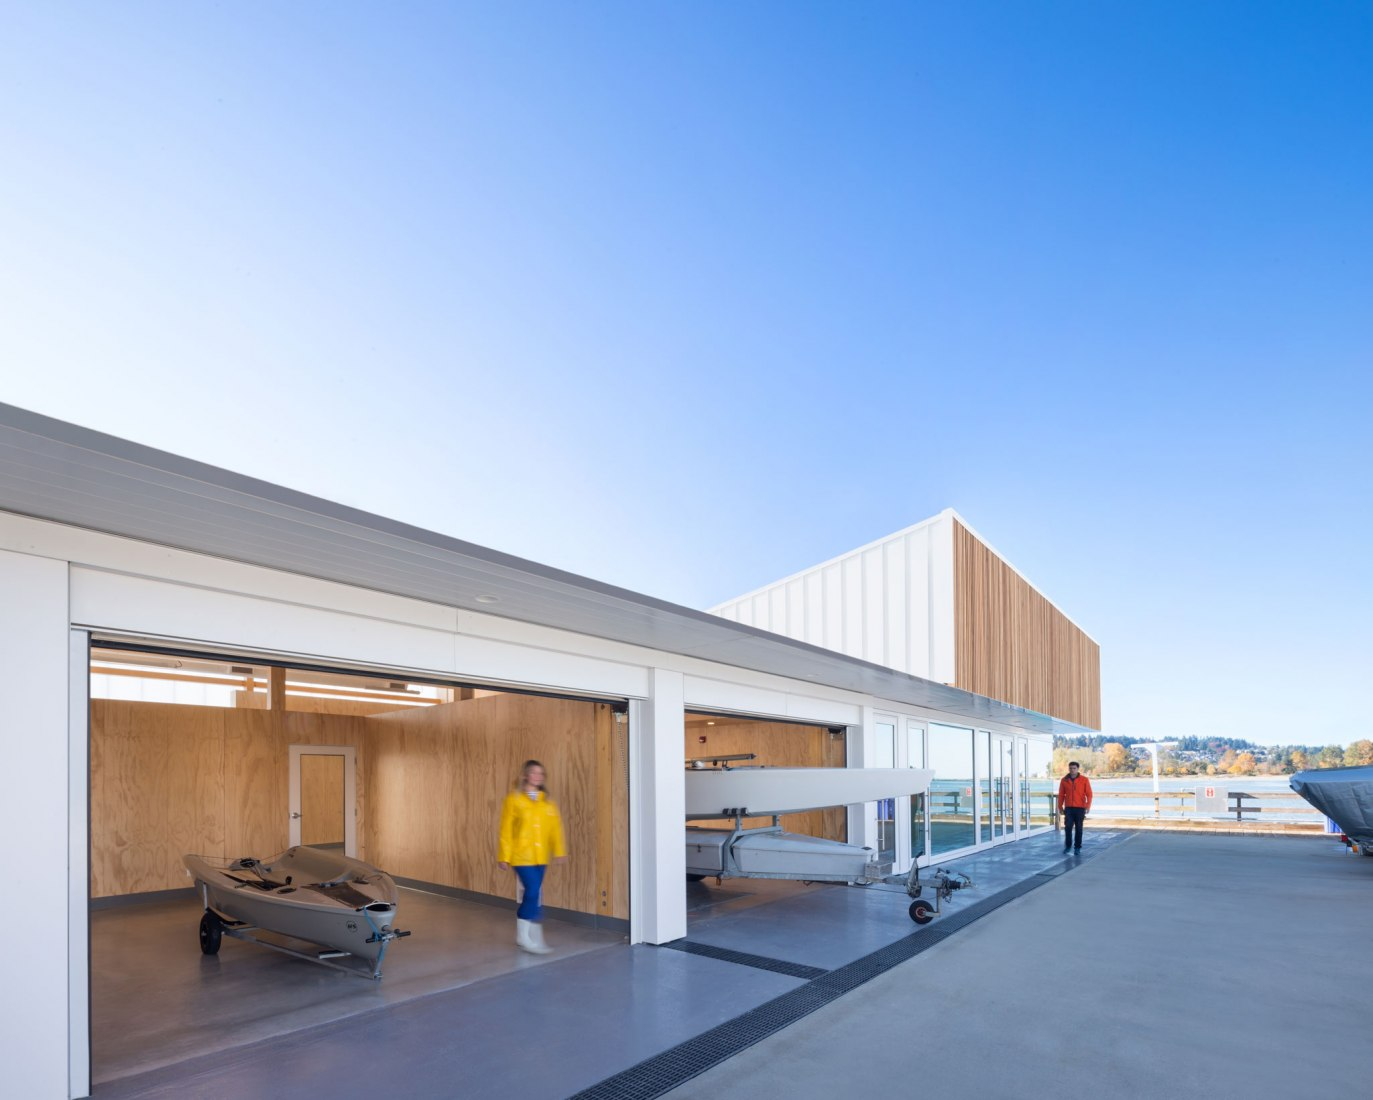 Vista exterior. Edificio Dock por Michael Green Architecture. Fotografía por Ema Peter